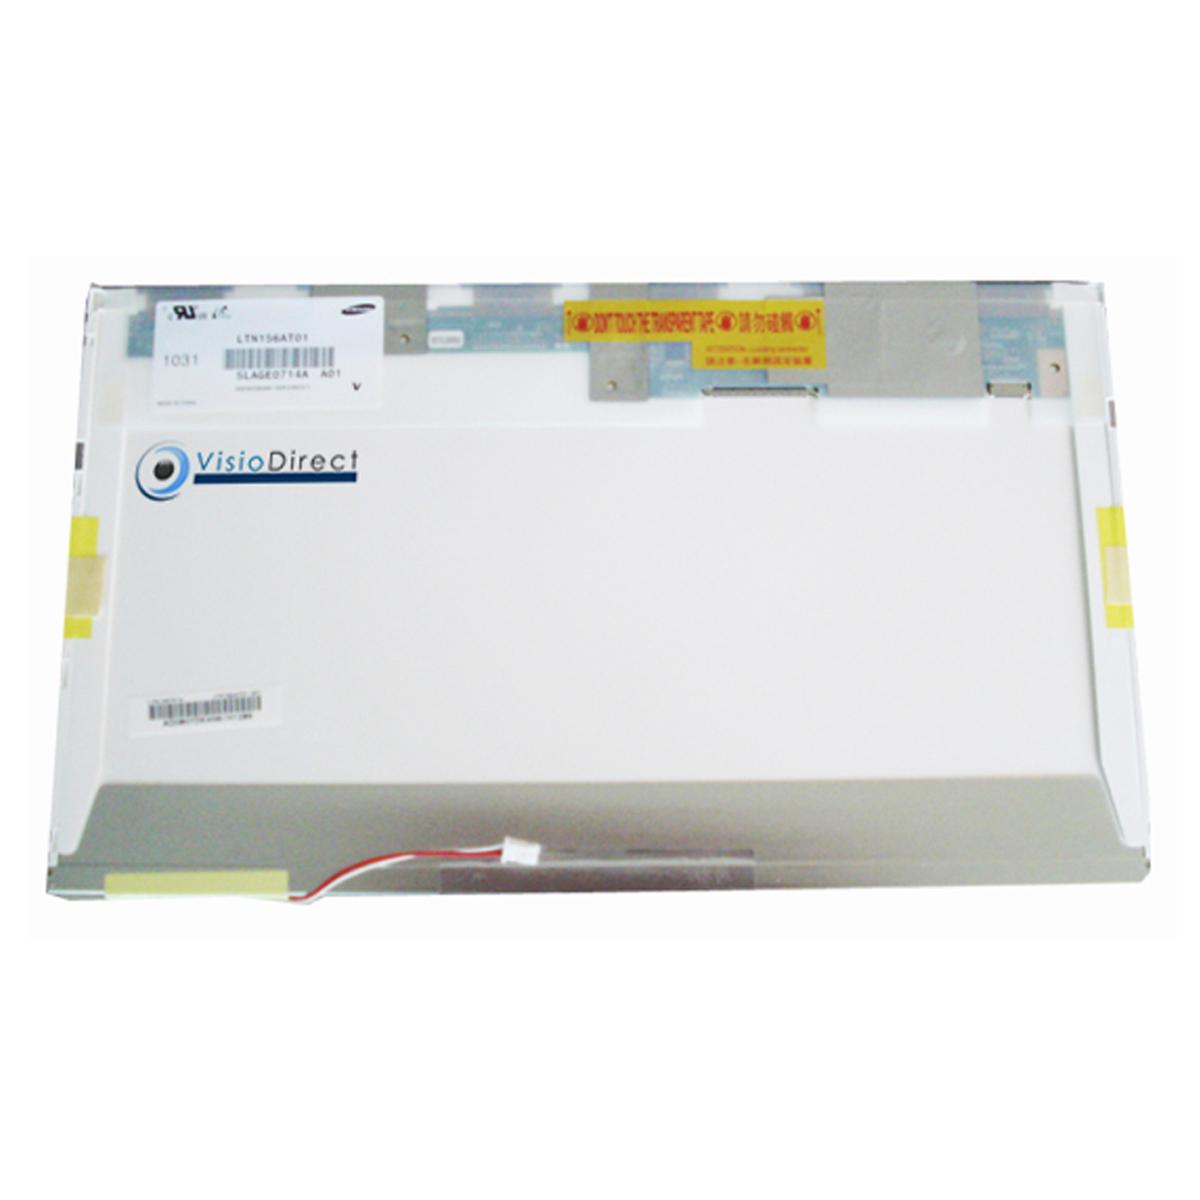 Dalle Ecran 15.6 LCD pour ordi...